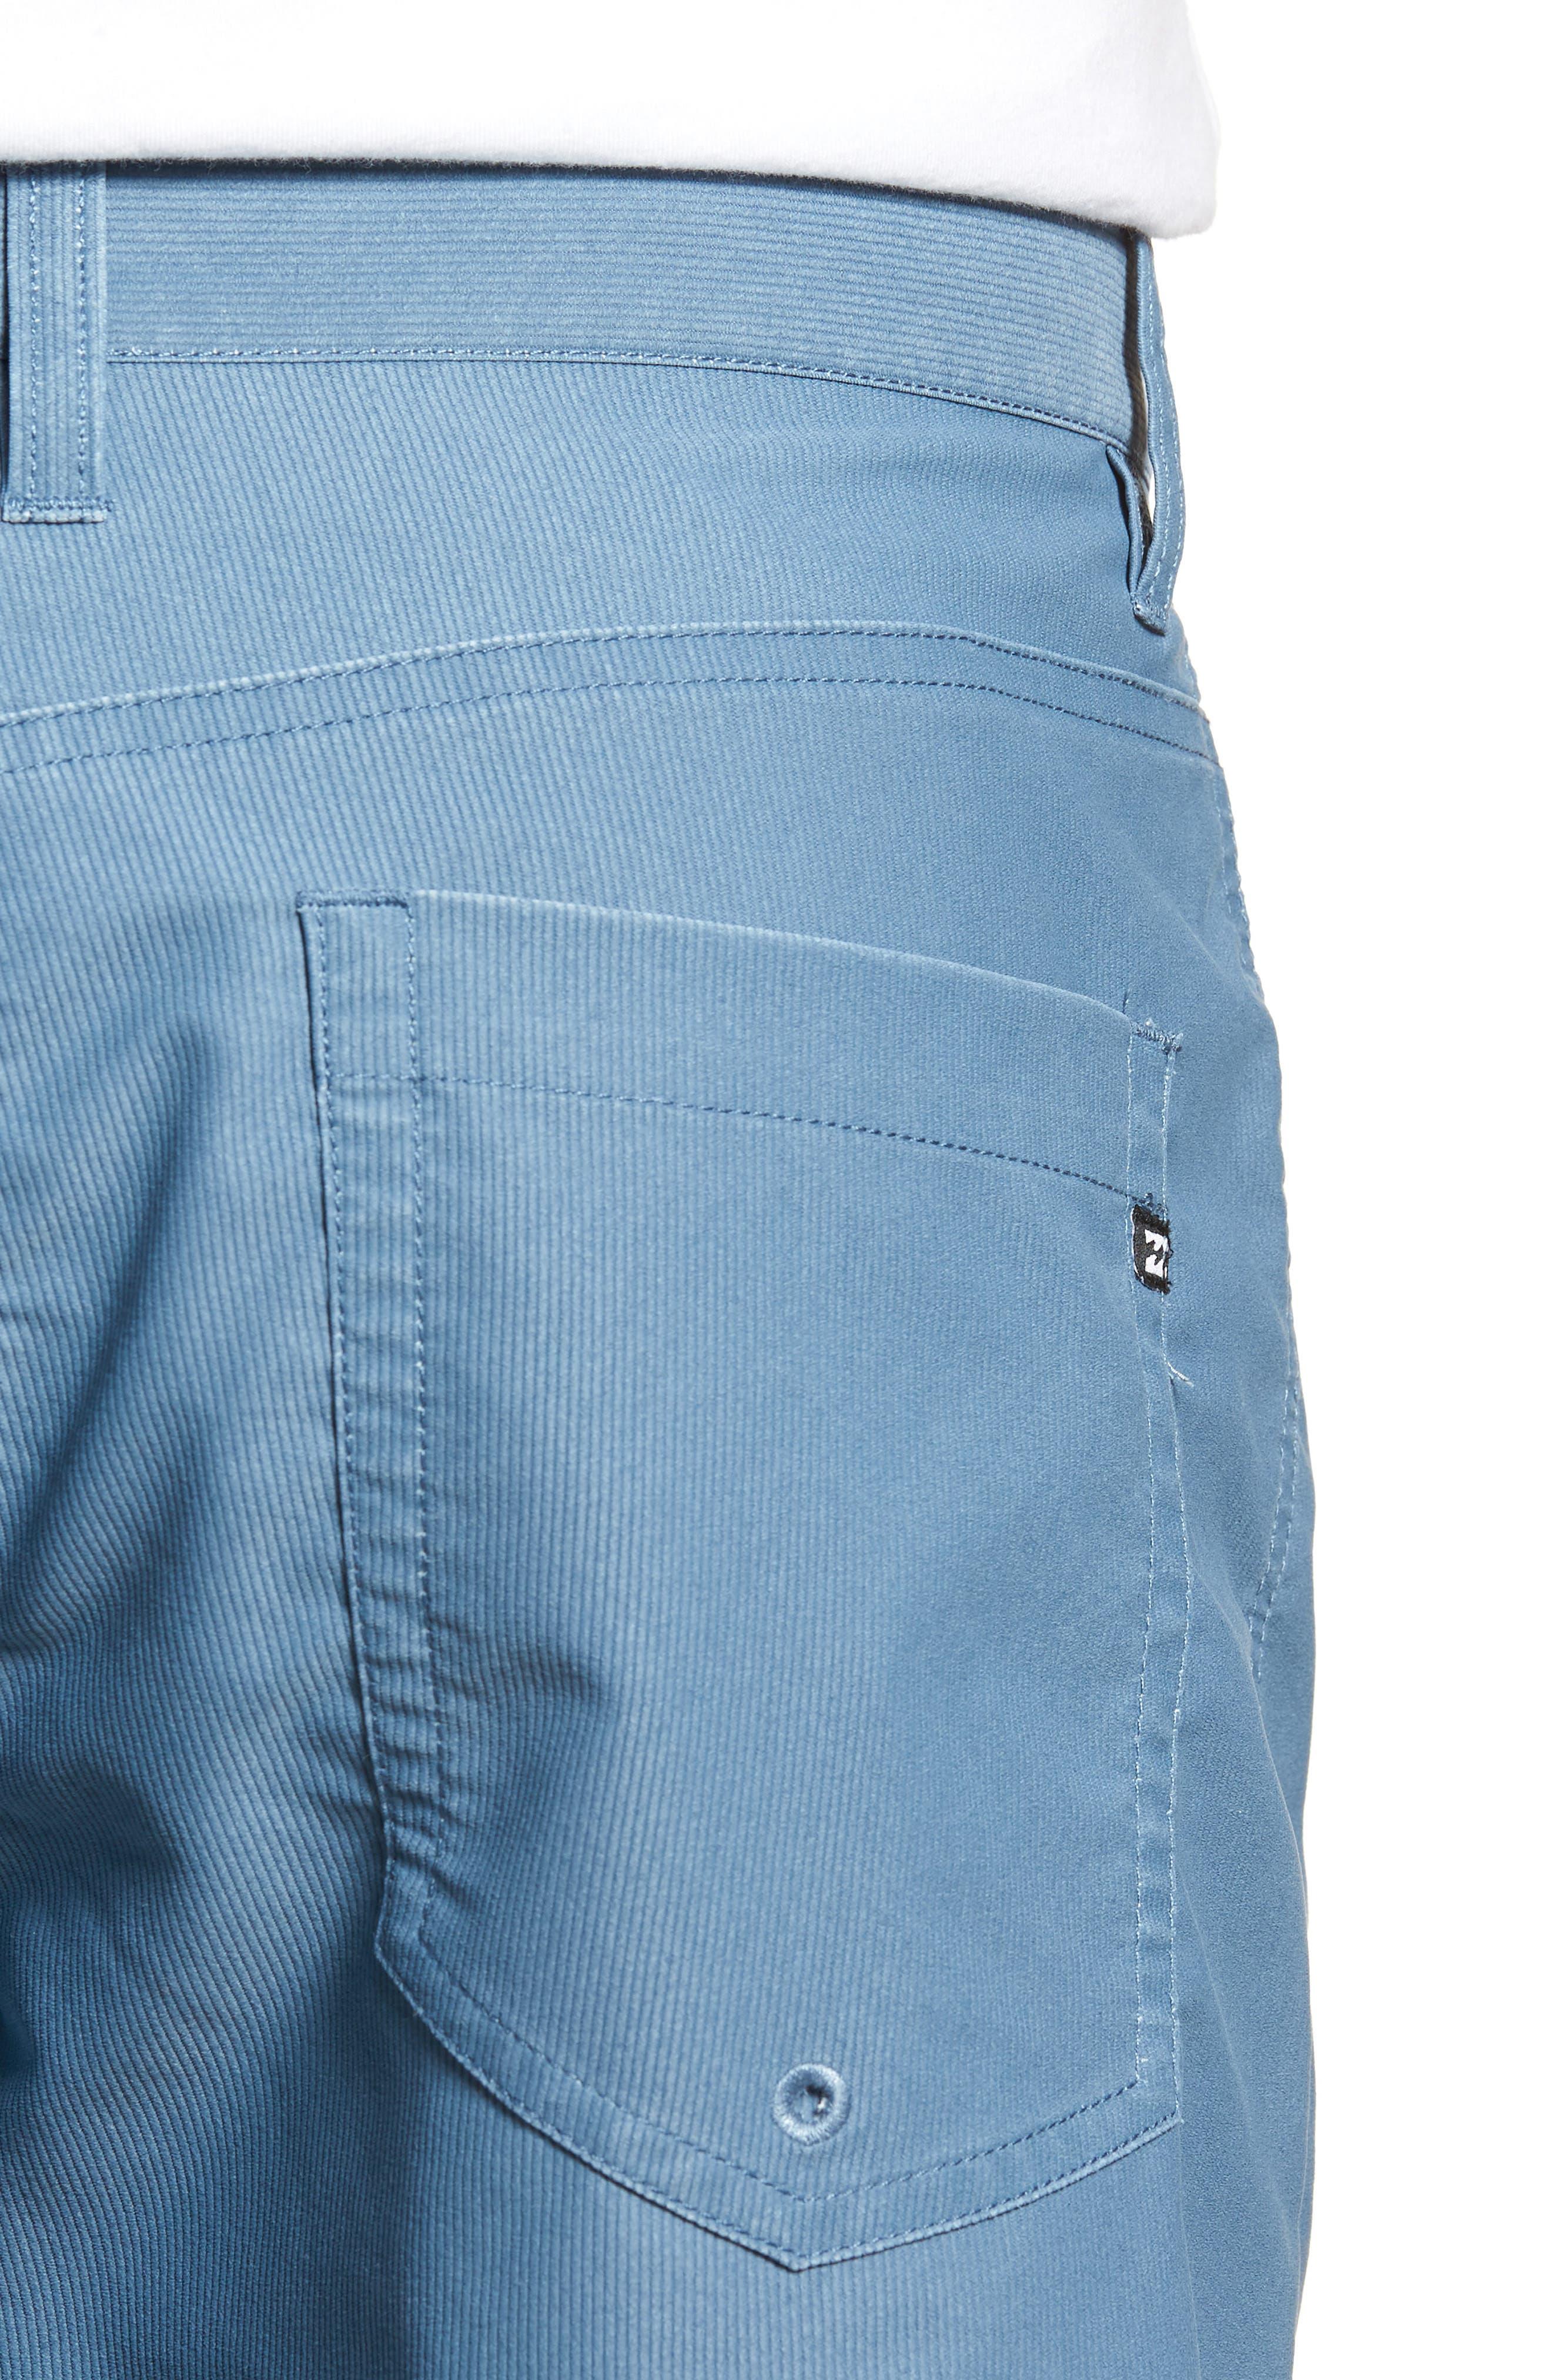 Outsider X Surf Corduroy Shorts,                             Alternate thumbnail 4, color,                             Powder Blue